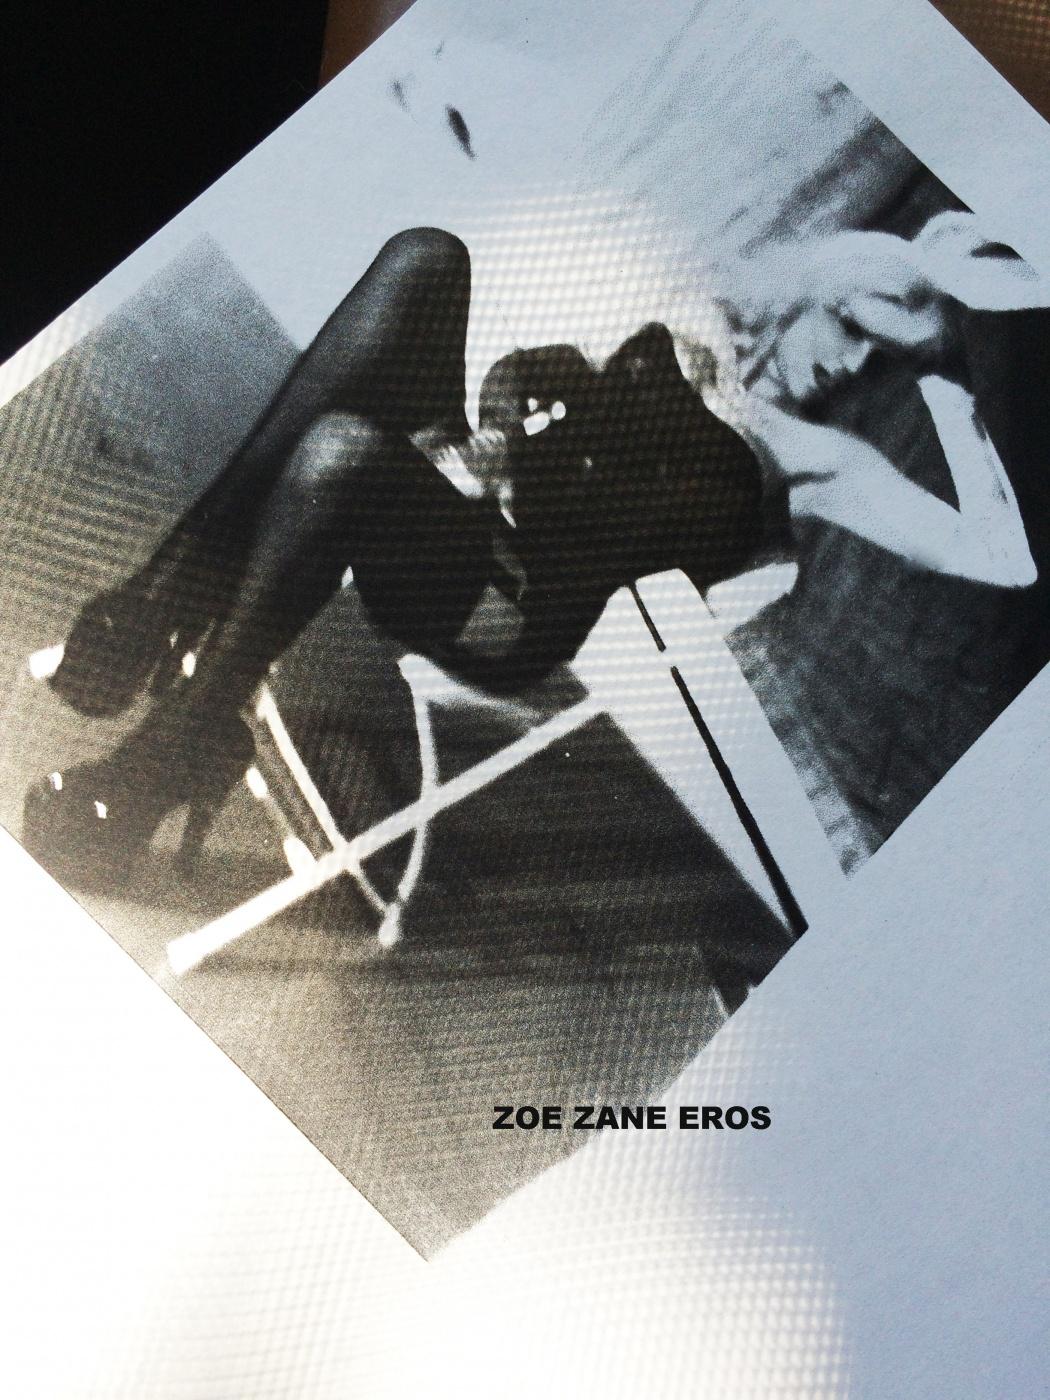 Zoe Zane Over 60